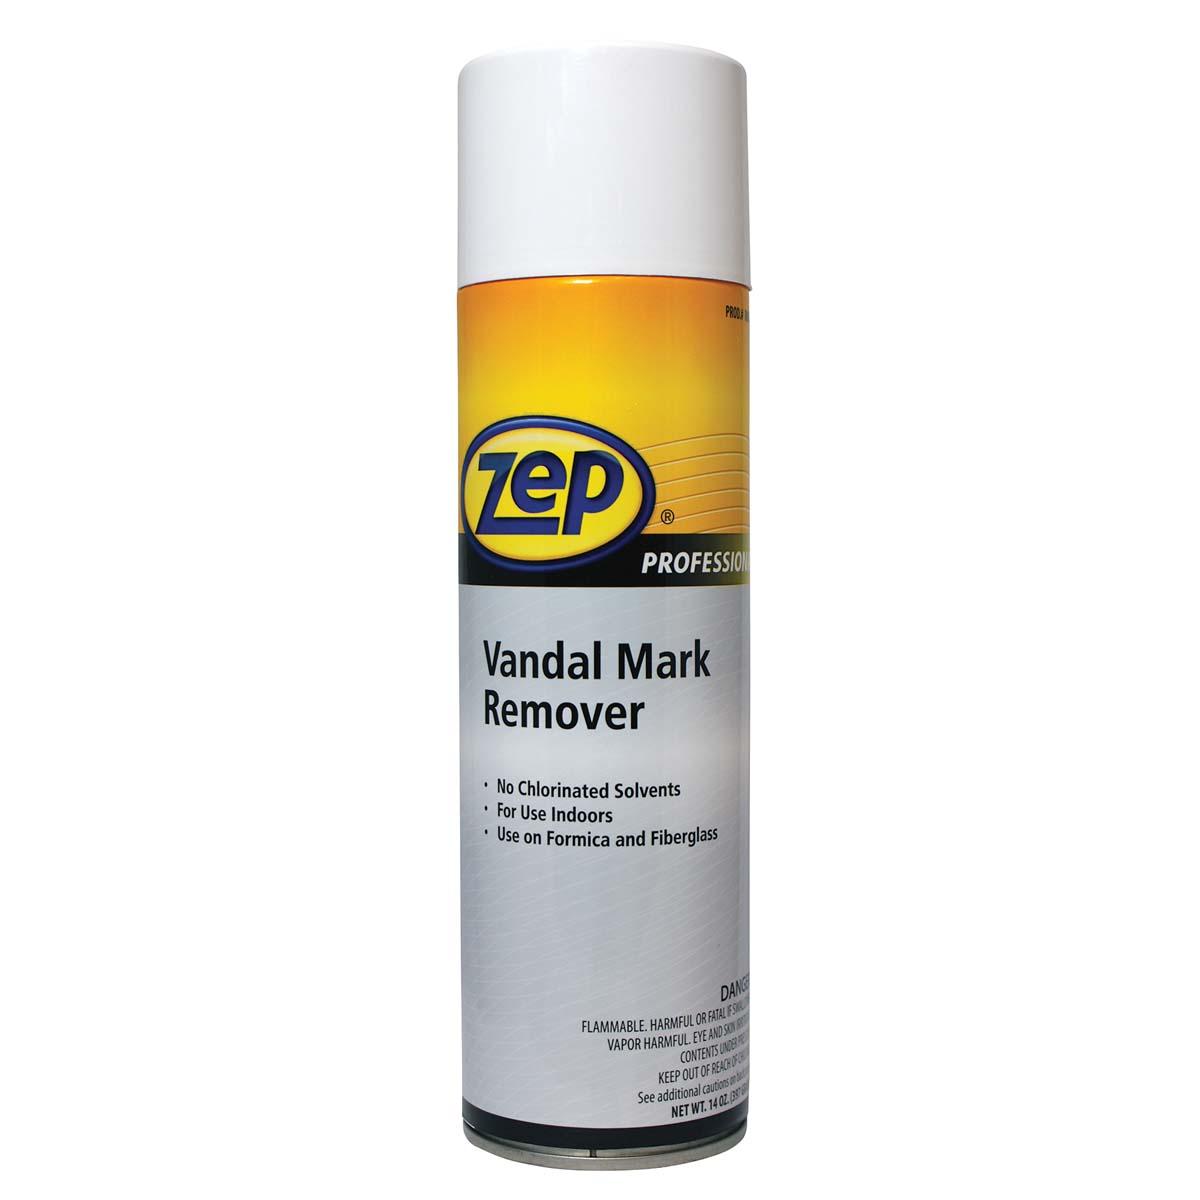 ZEP Vandal Mark Remover